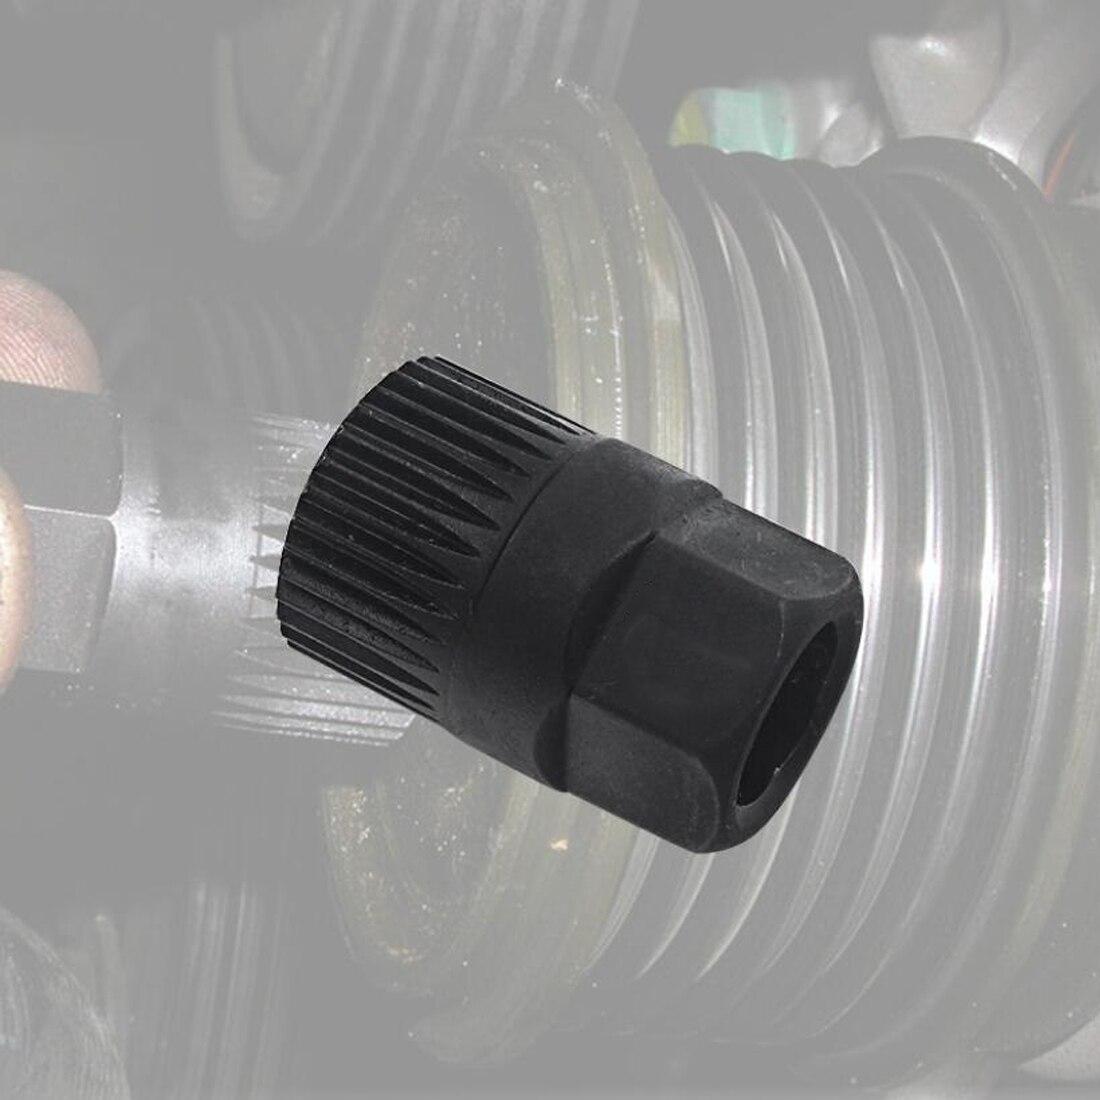 Removal Tool Alternator Clutch Free Wheel Pulley 33 Spline For VW /AUDI /FORD For PEUGEOT 33TxH17